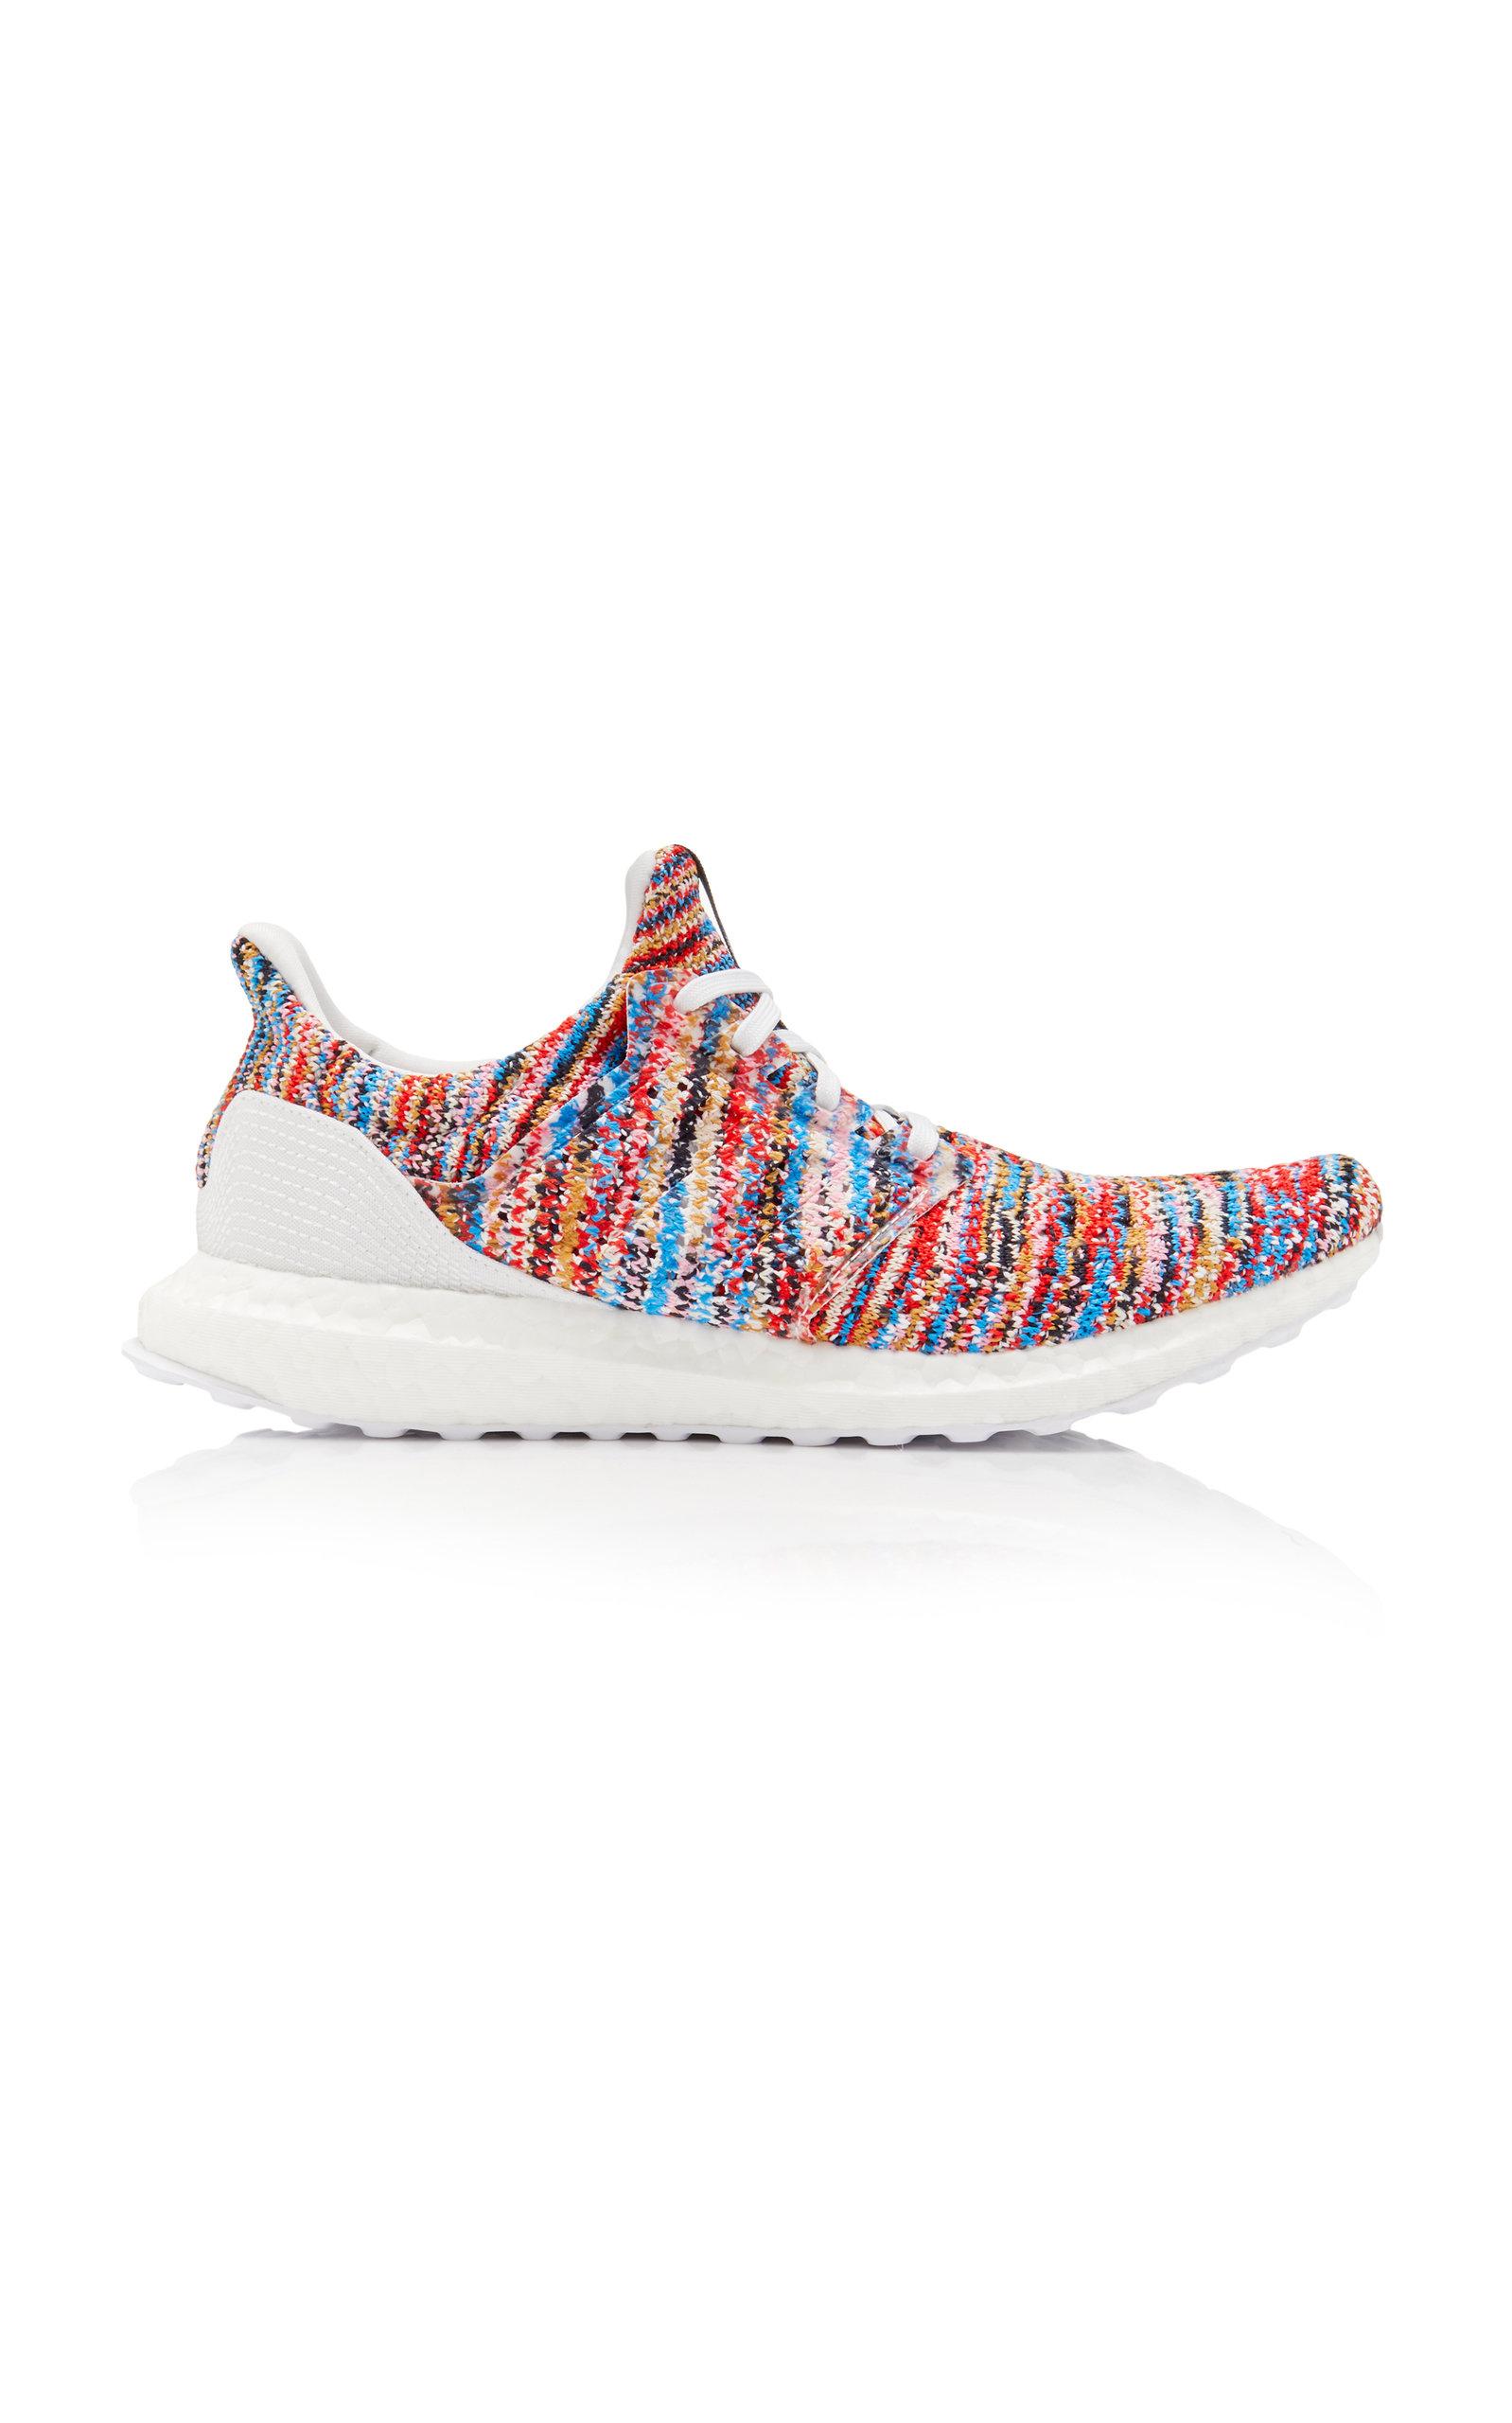 sports shoes 90edb b0089 Ultraboost Clima Knit Low-Top Sneakers